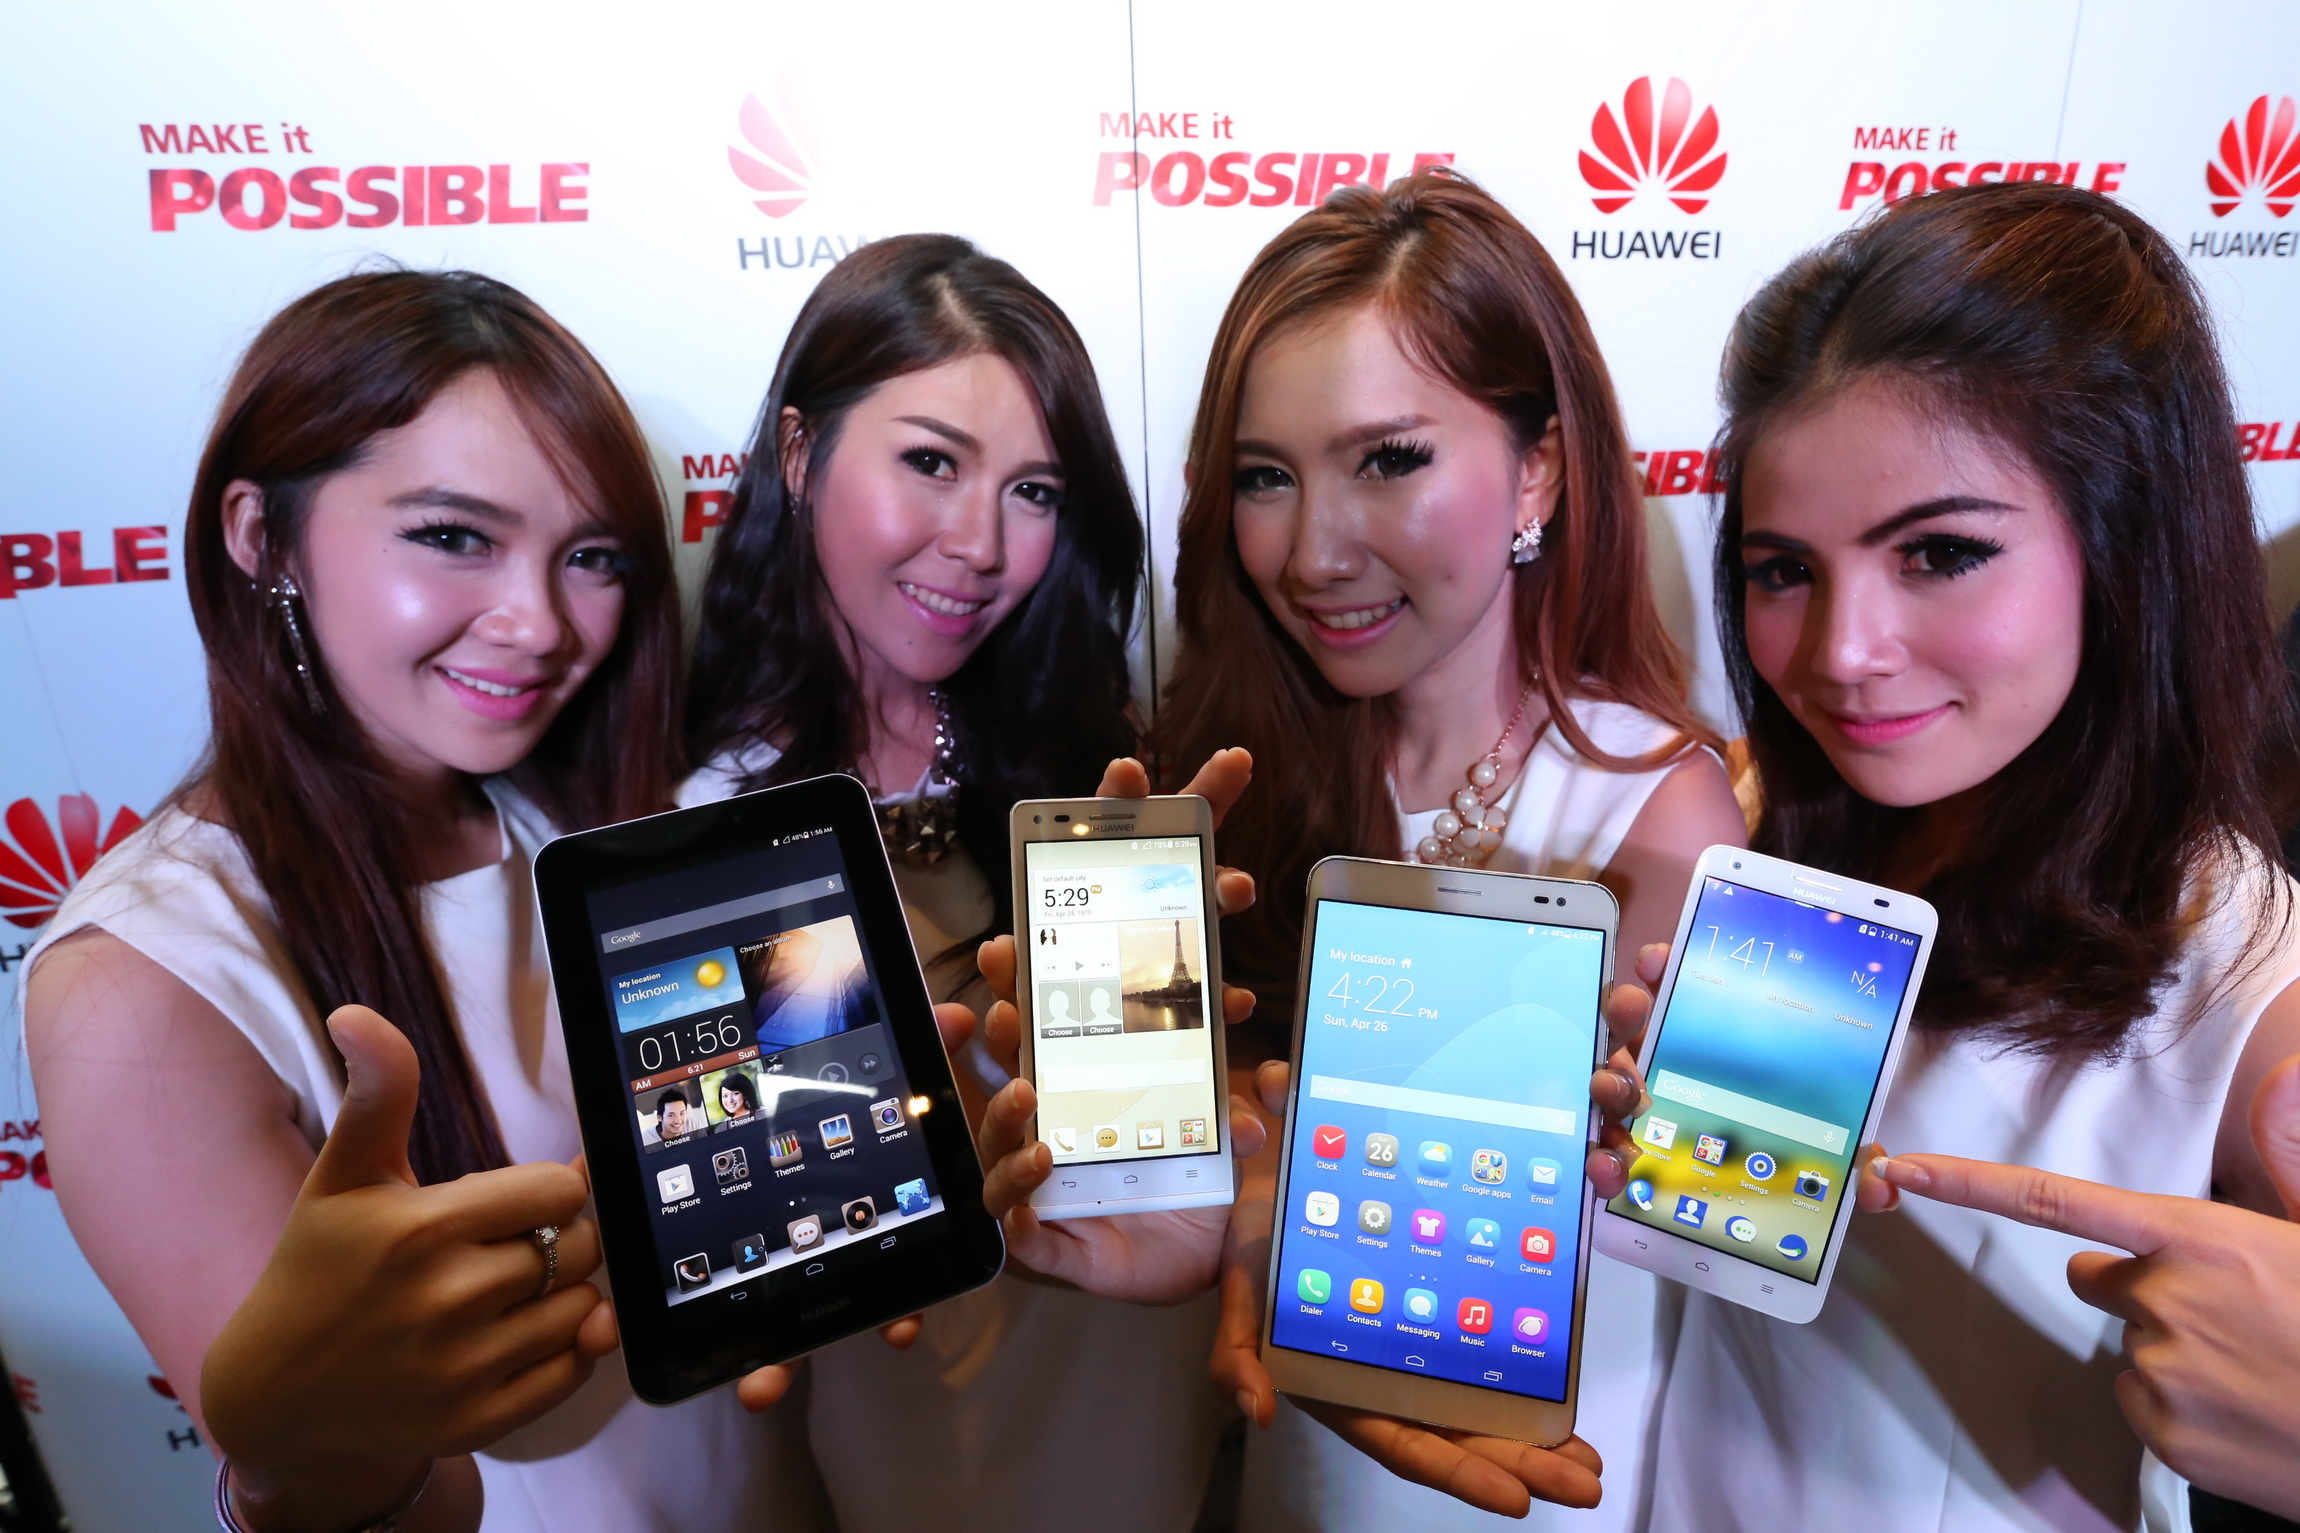 [PR News] HUAWEI (หัวเว่ย) ผู้นำตลาดมือถือโลก เผยโฉมสมาร์ทโฟนและแท็บเล็ต 4 รุ่นล่าสุดสู่ตลาดเมืองไทย